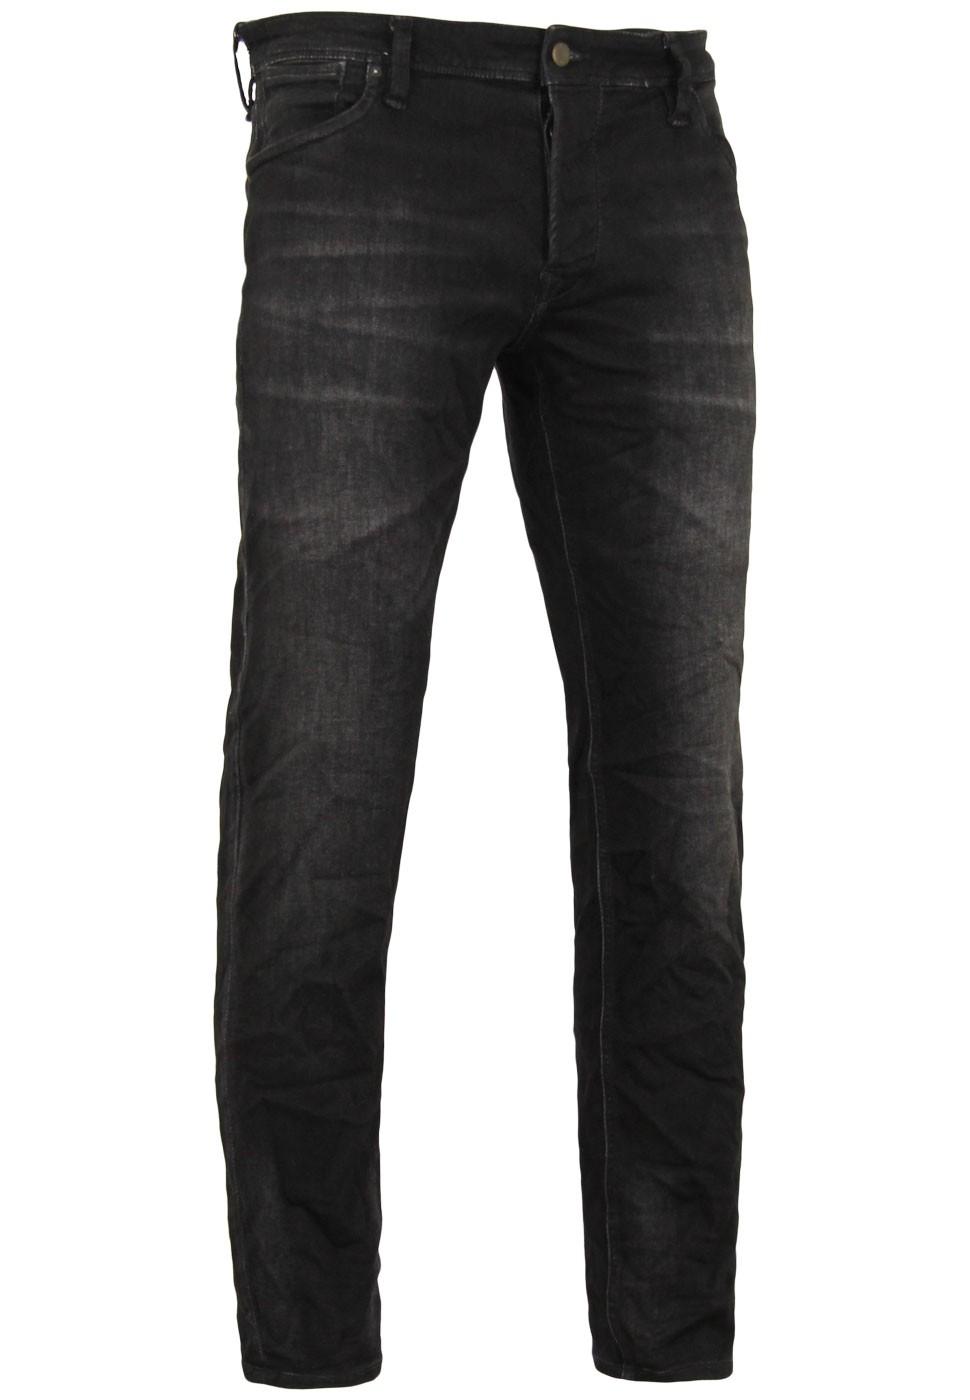 Jack /& Jones Jeans jjimike jjdash GE 784 Indigo Knit NOOS